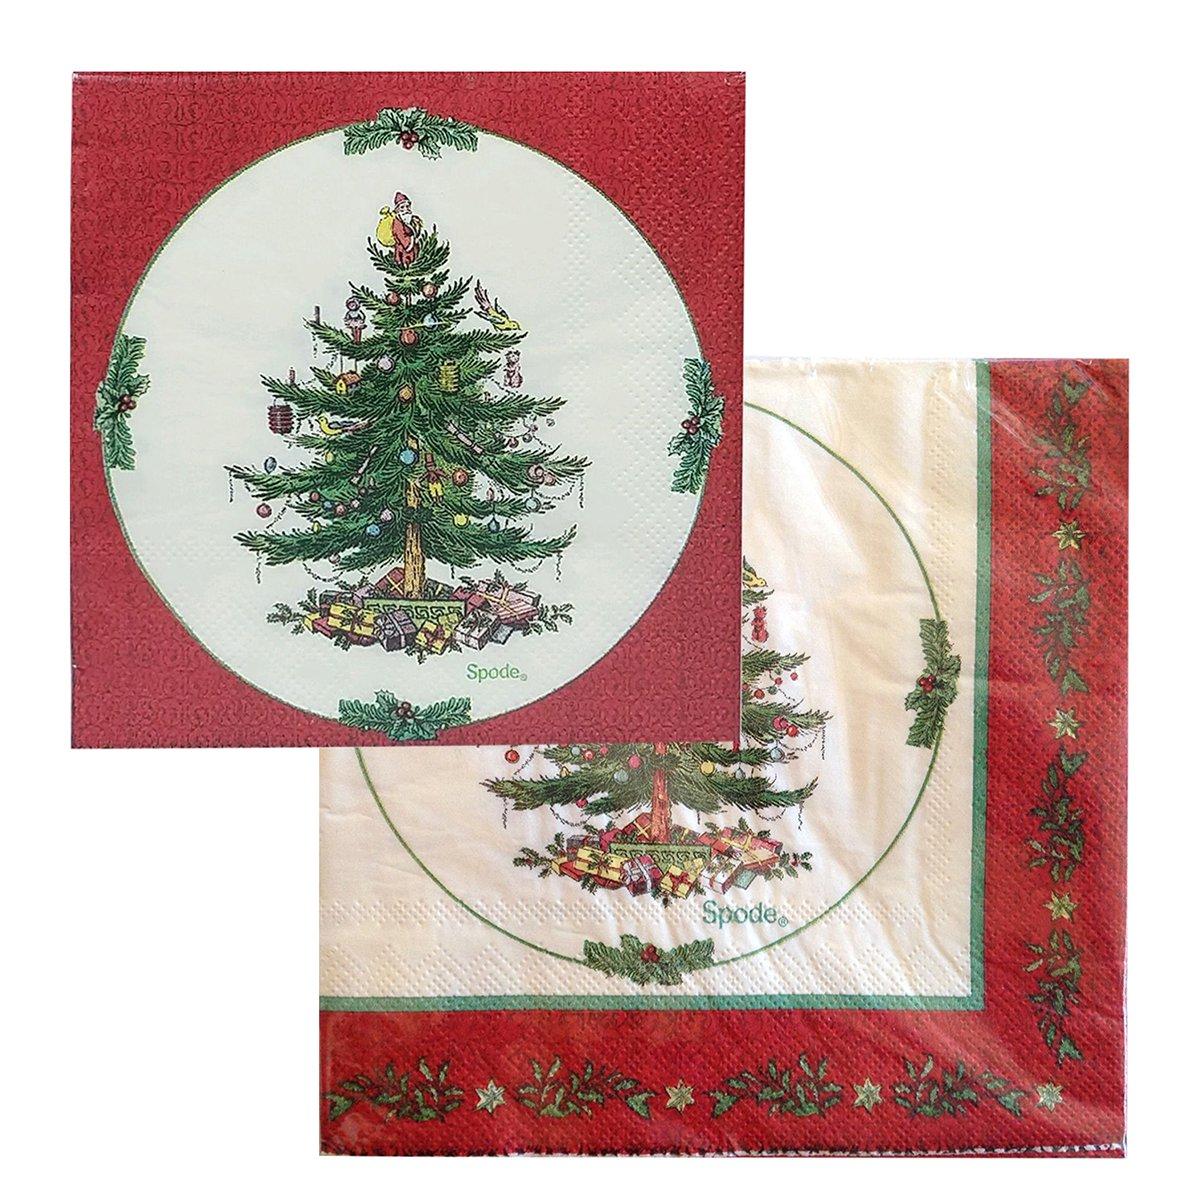 SpodeクリスマスツリーLuncheon &カクテルナプキンセット、80のセット   B078RX6PYG